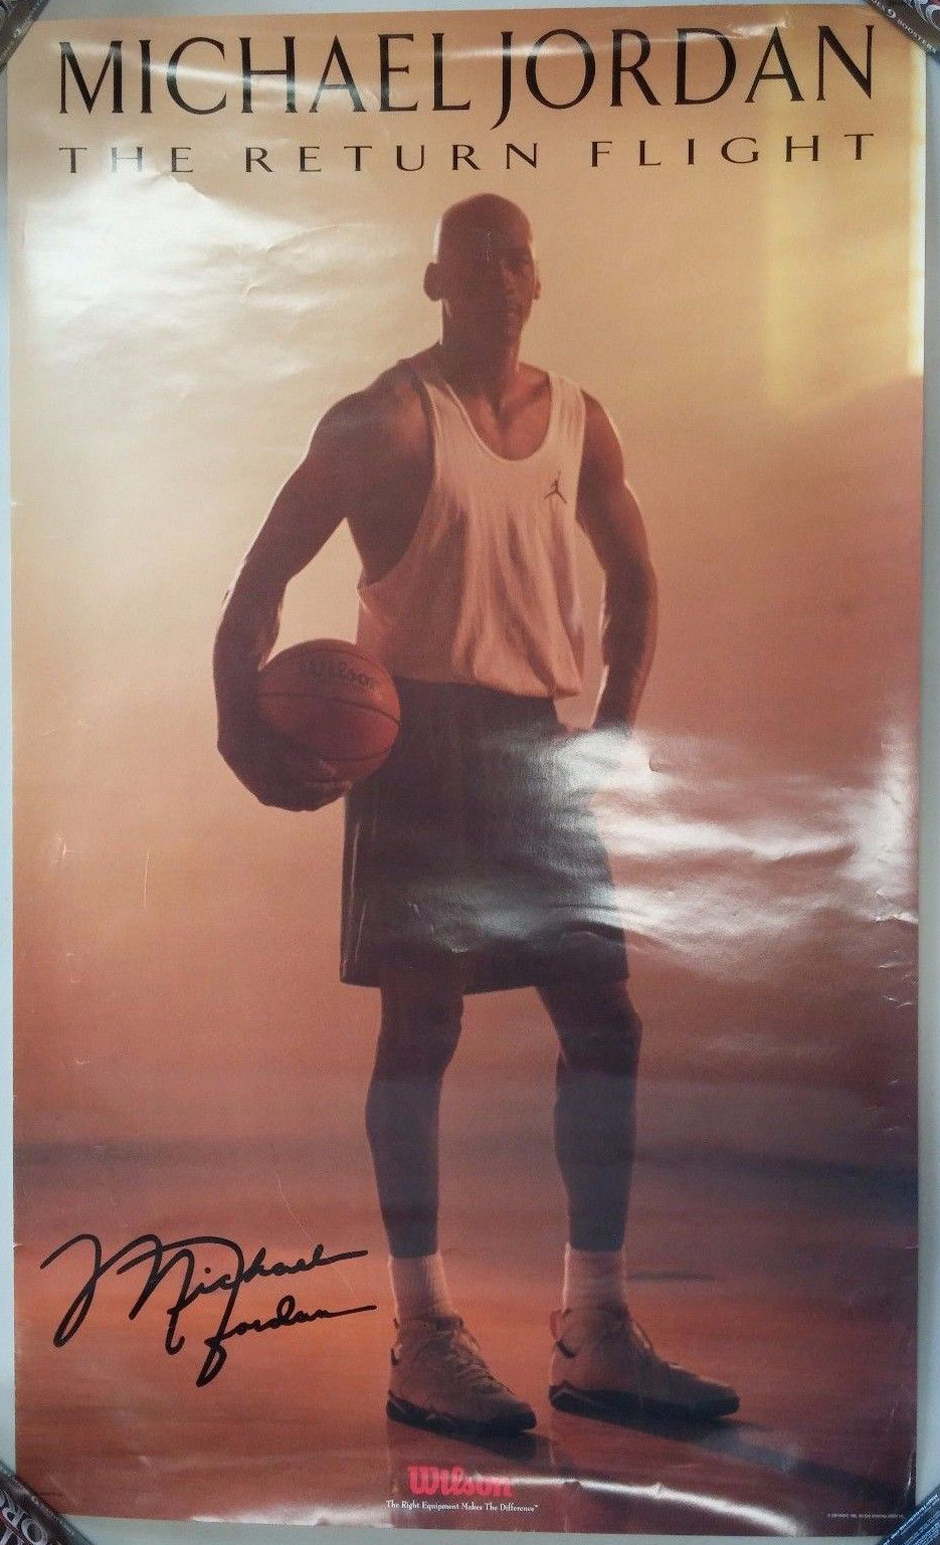 Michael Jordan  Dunking Framed Poster Print 36x24 on a